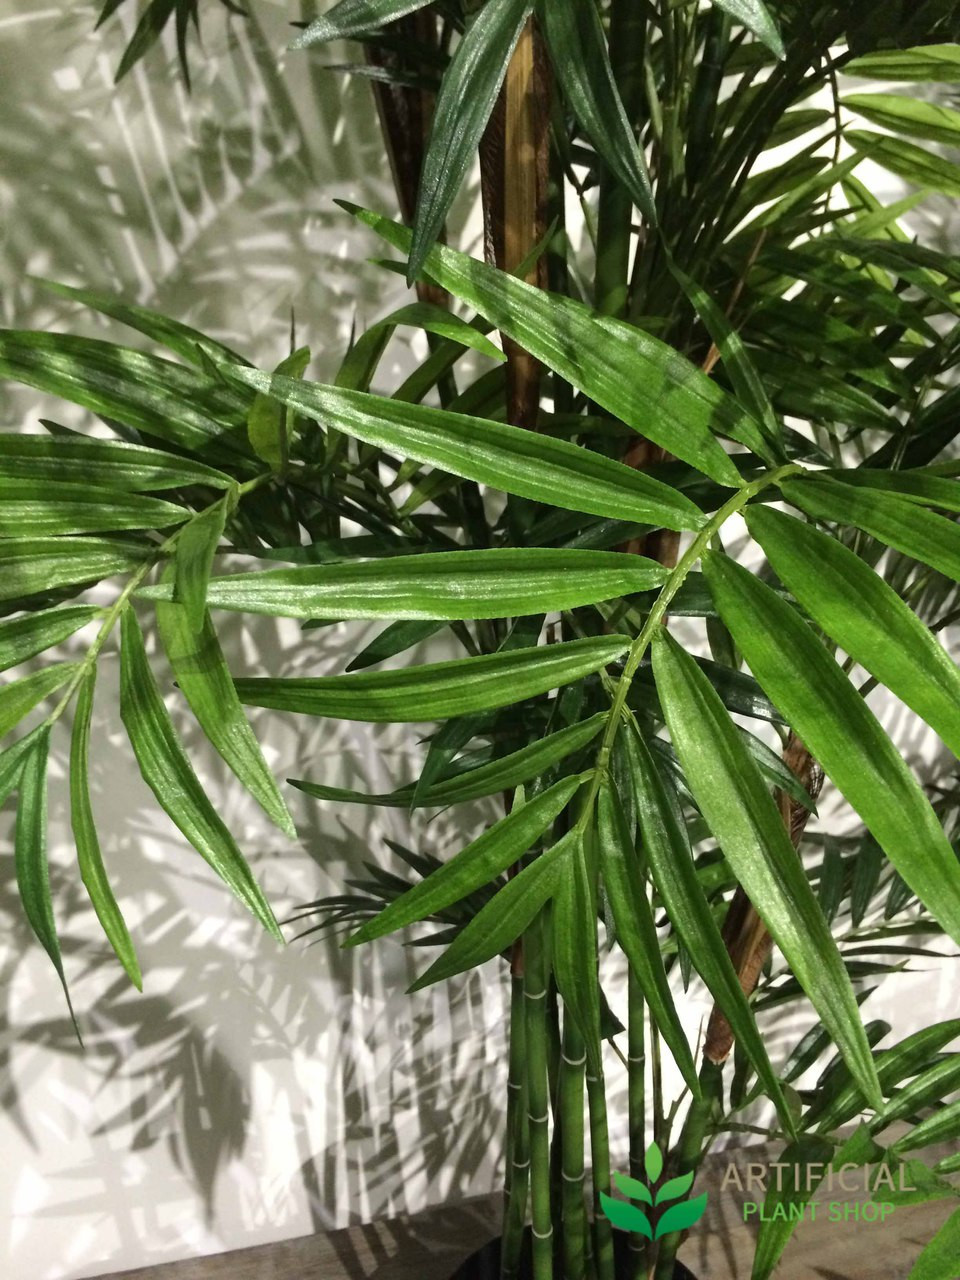 Parlour Palm leaves